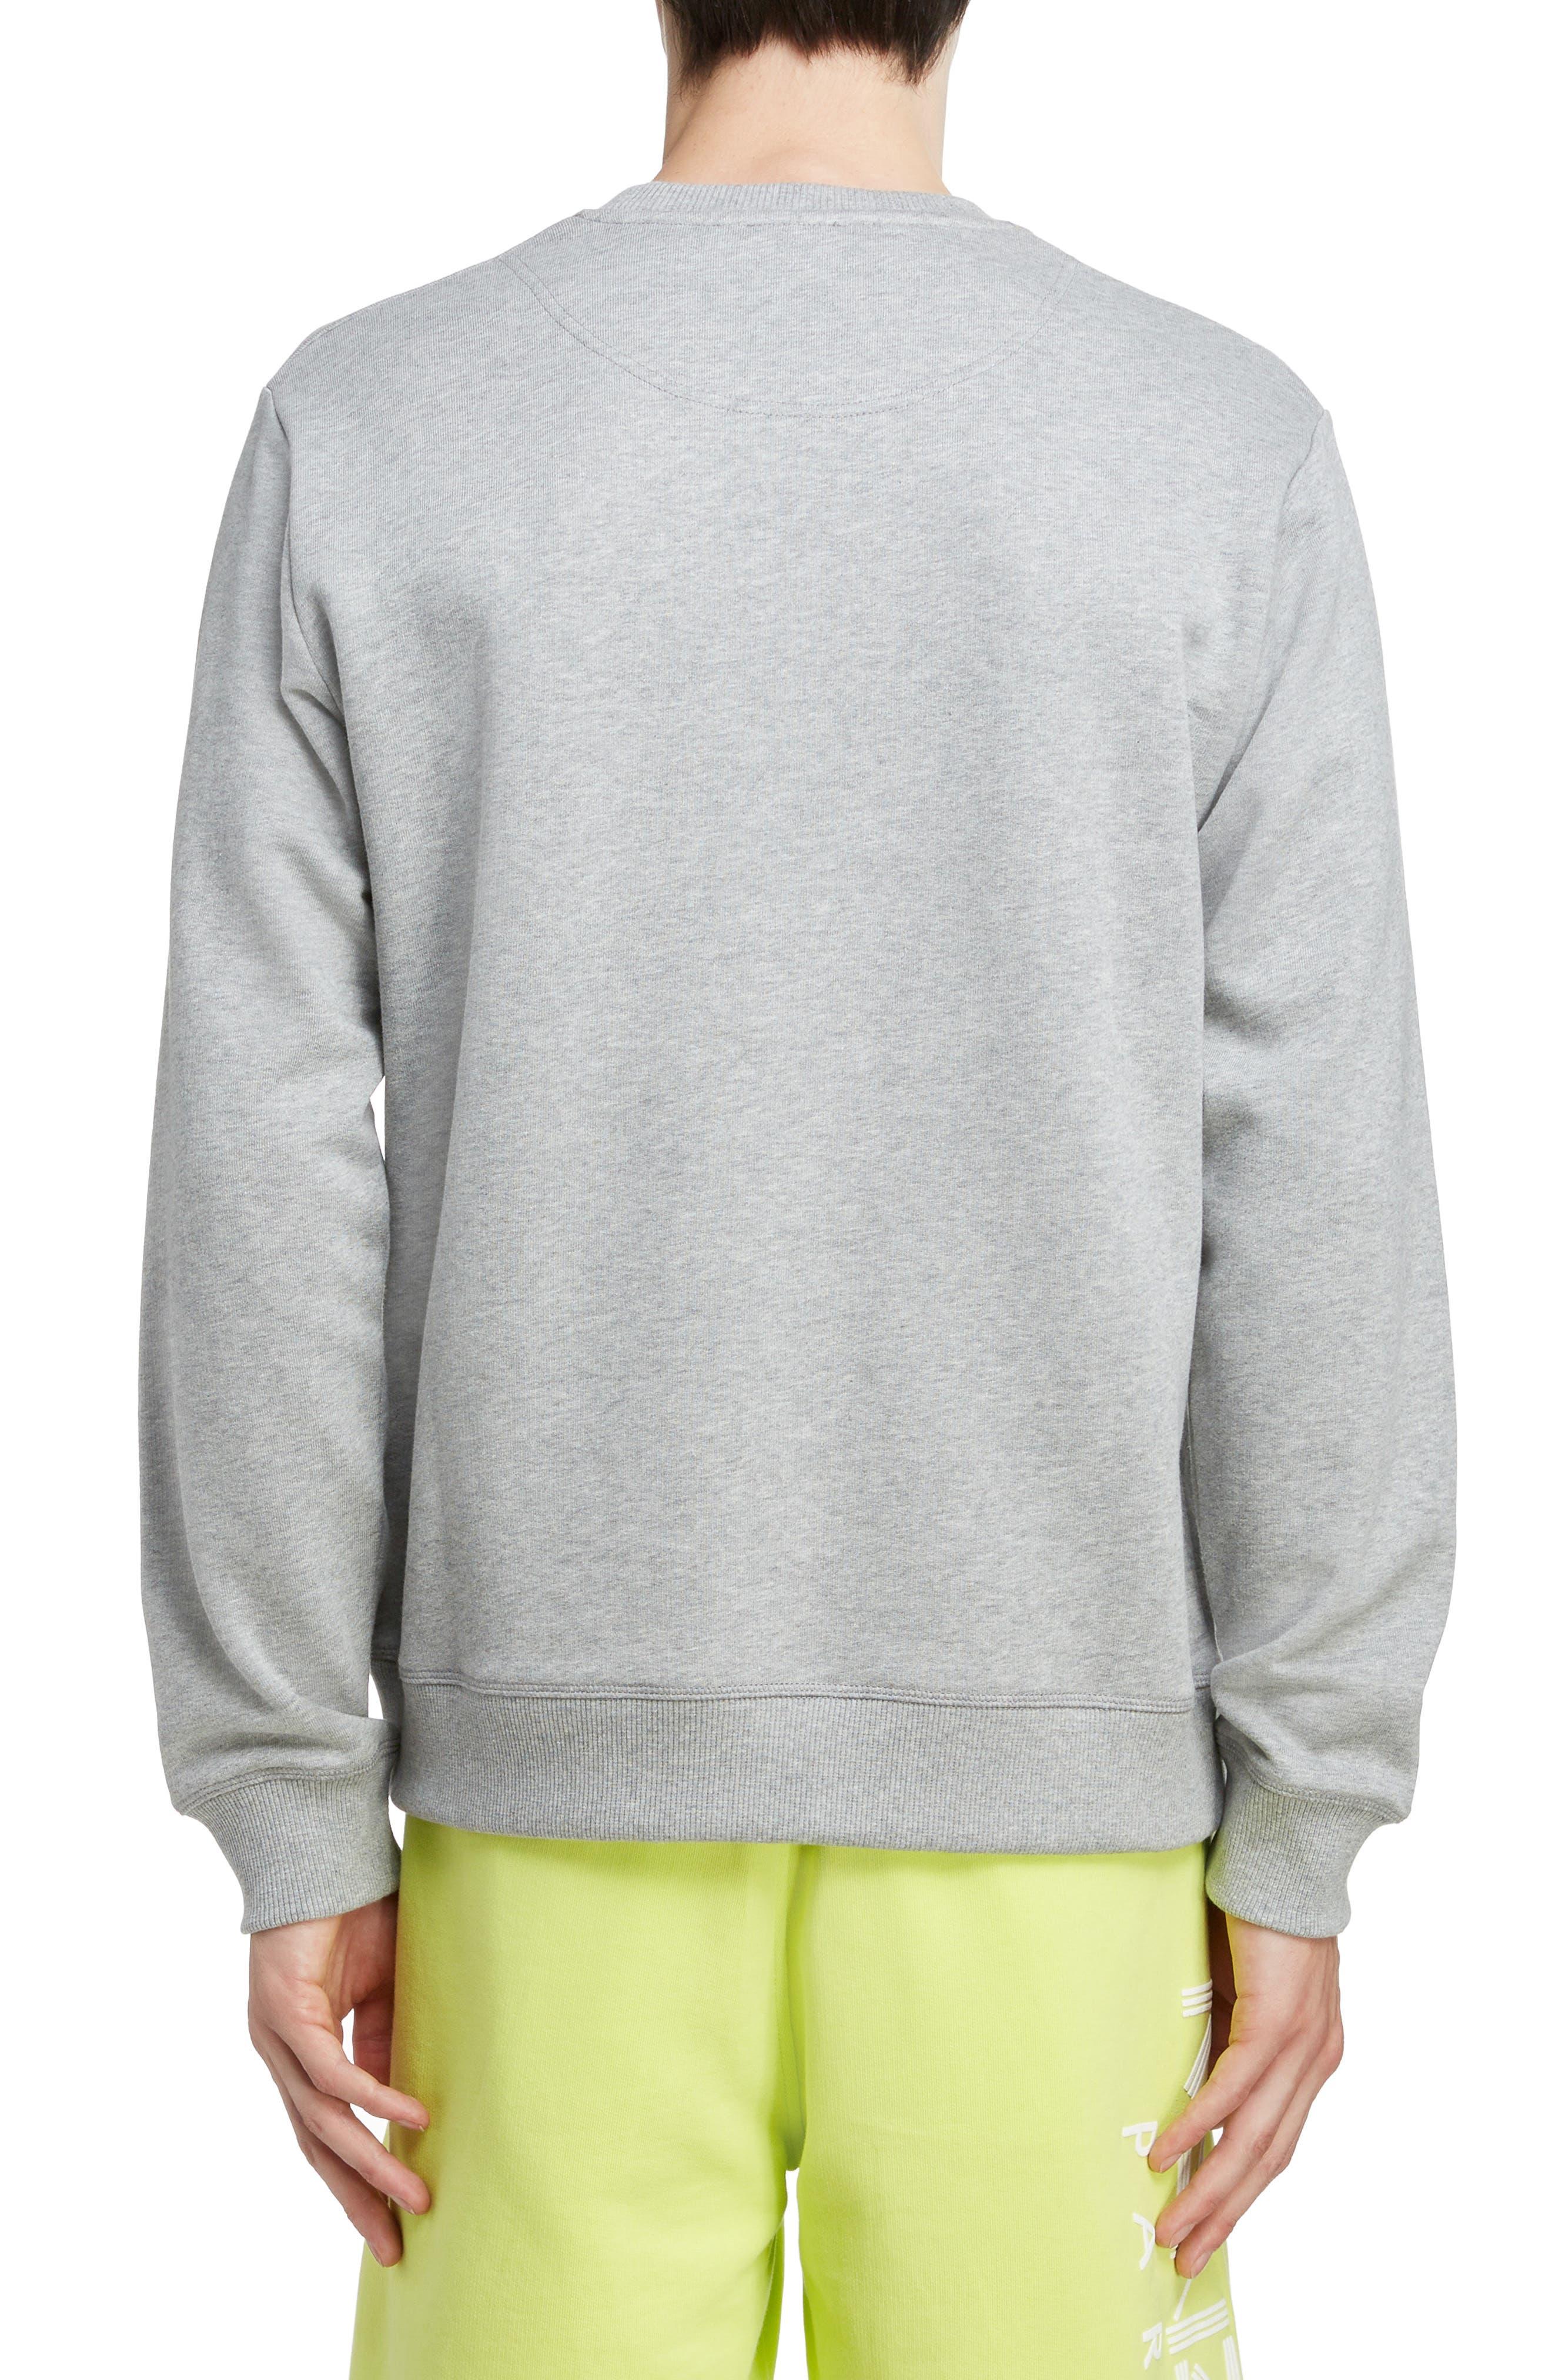 KENZO, Tiger Sweatshirt, Alternate thumbnail 2, color, PEARL GREY